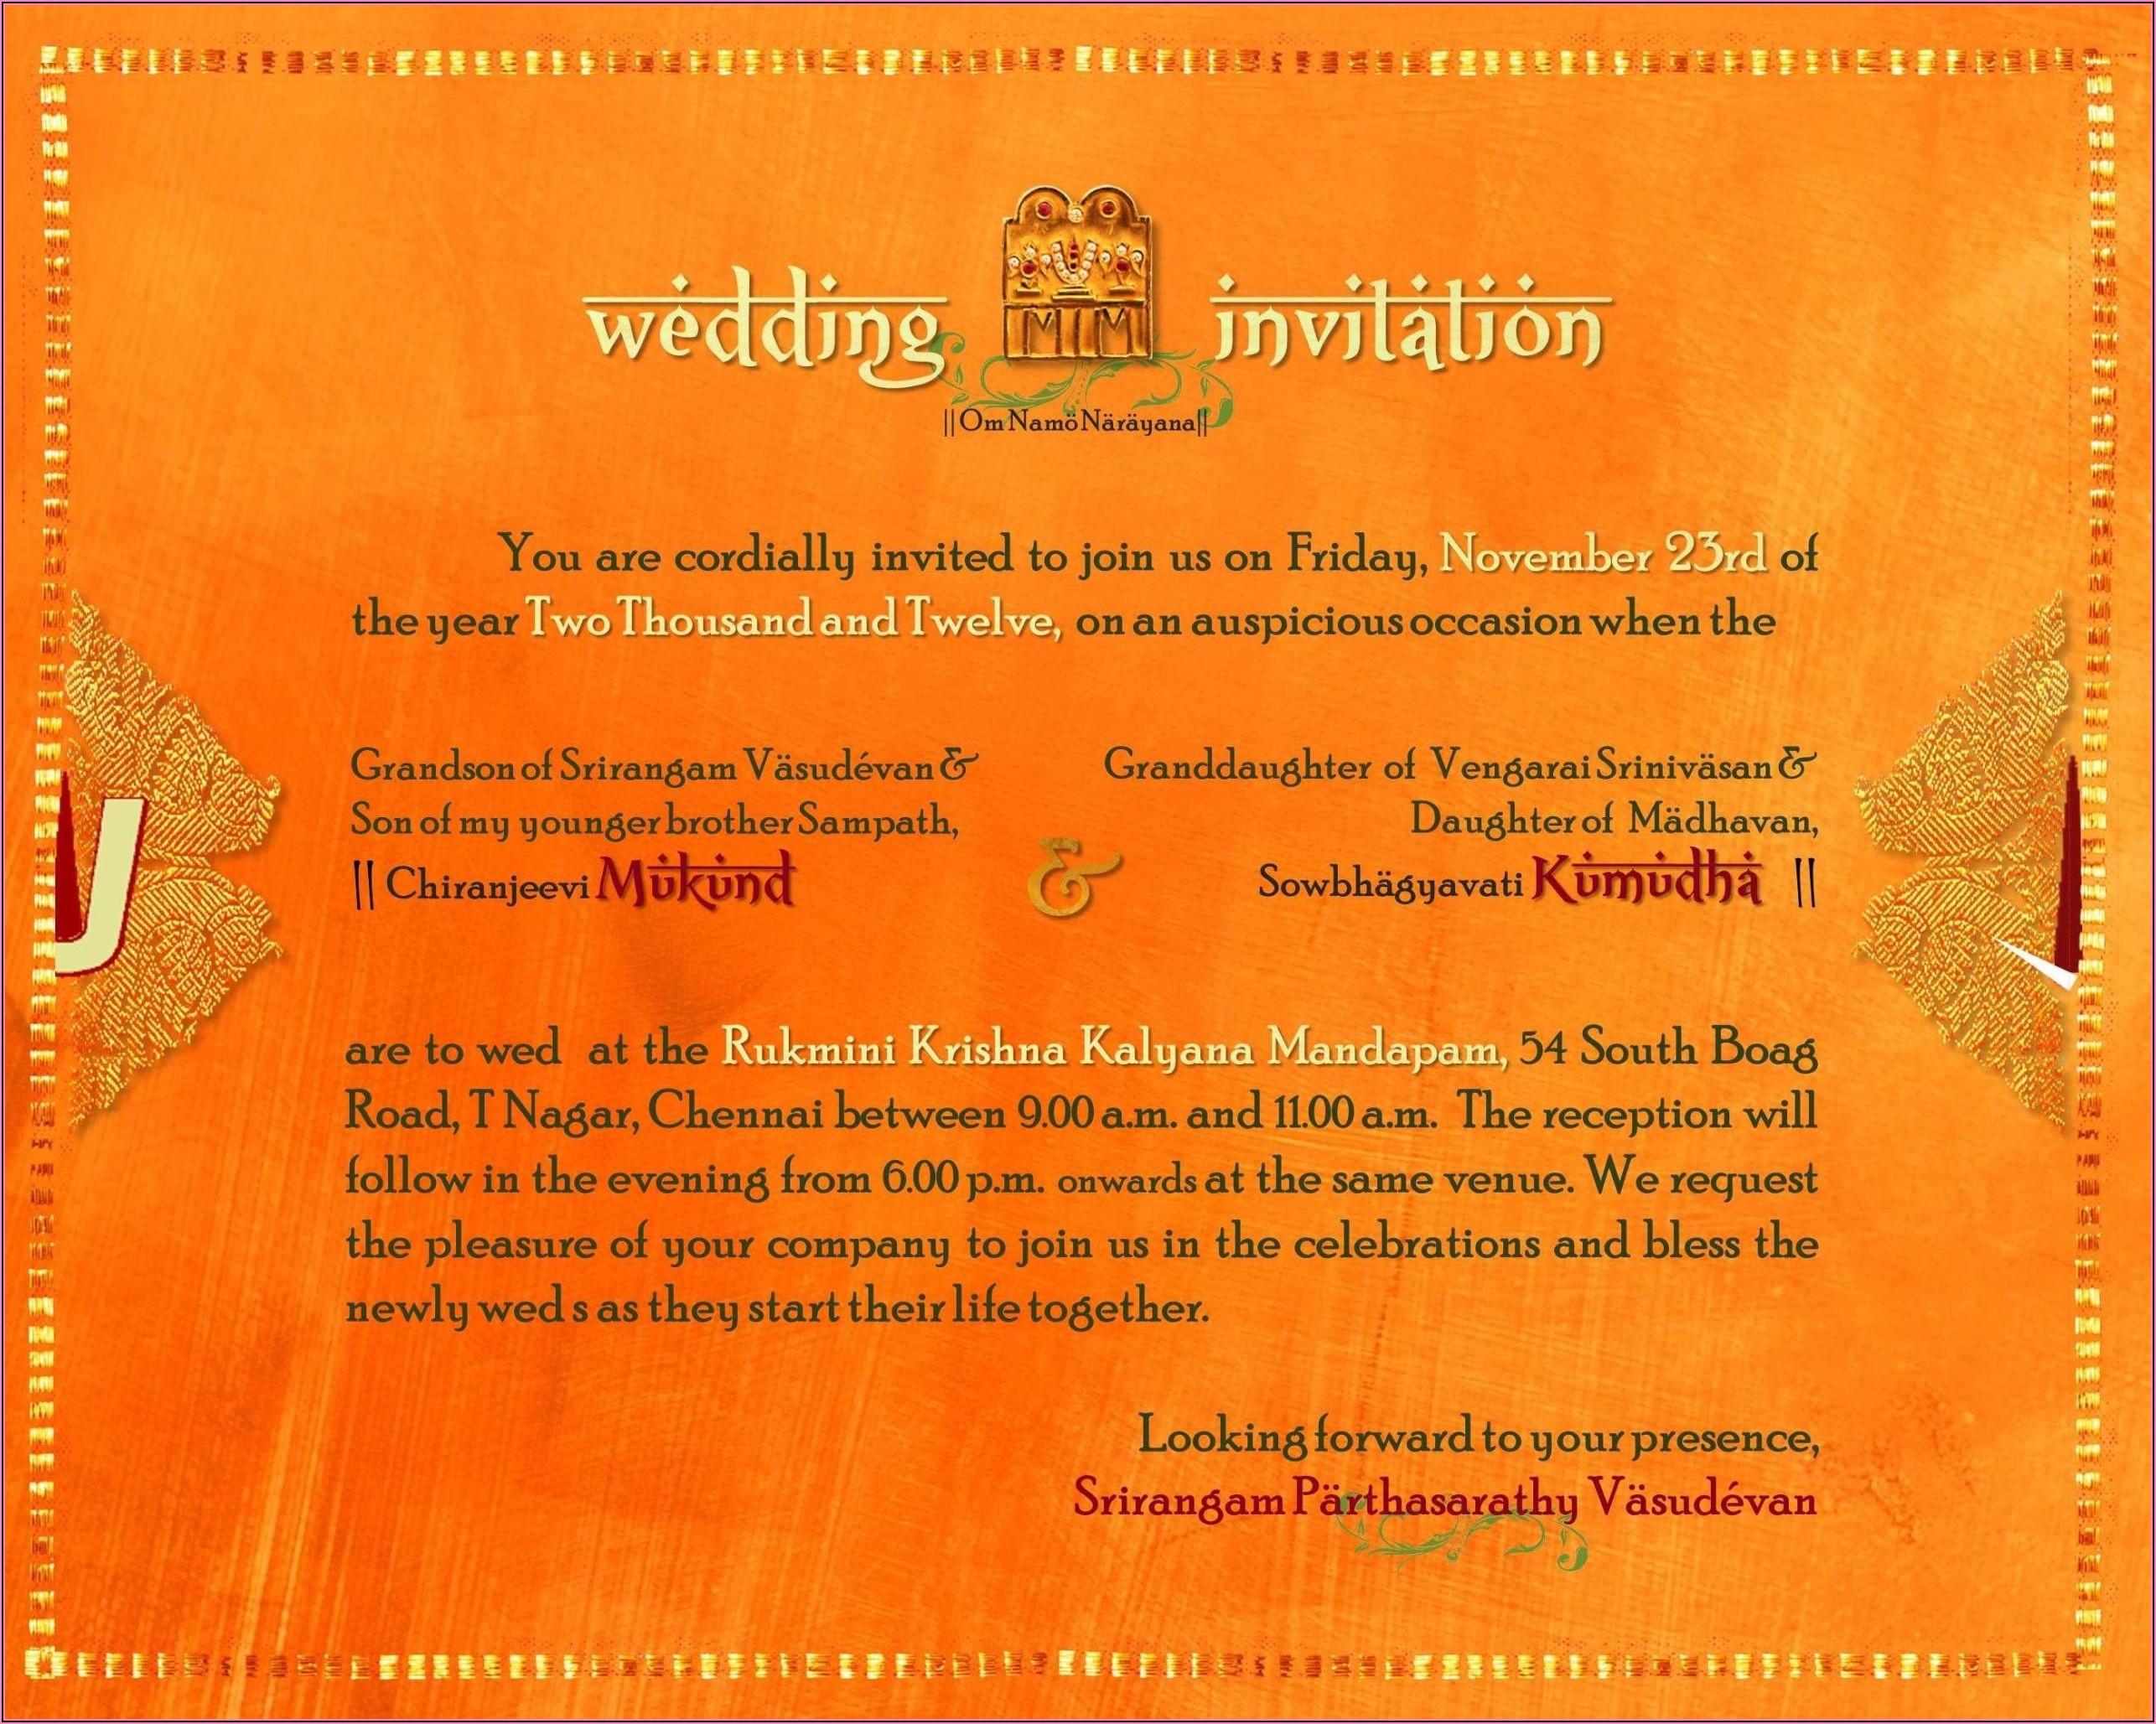 Housewarming Invitation Wording Samples In Tamil